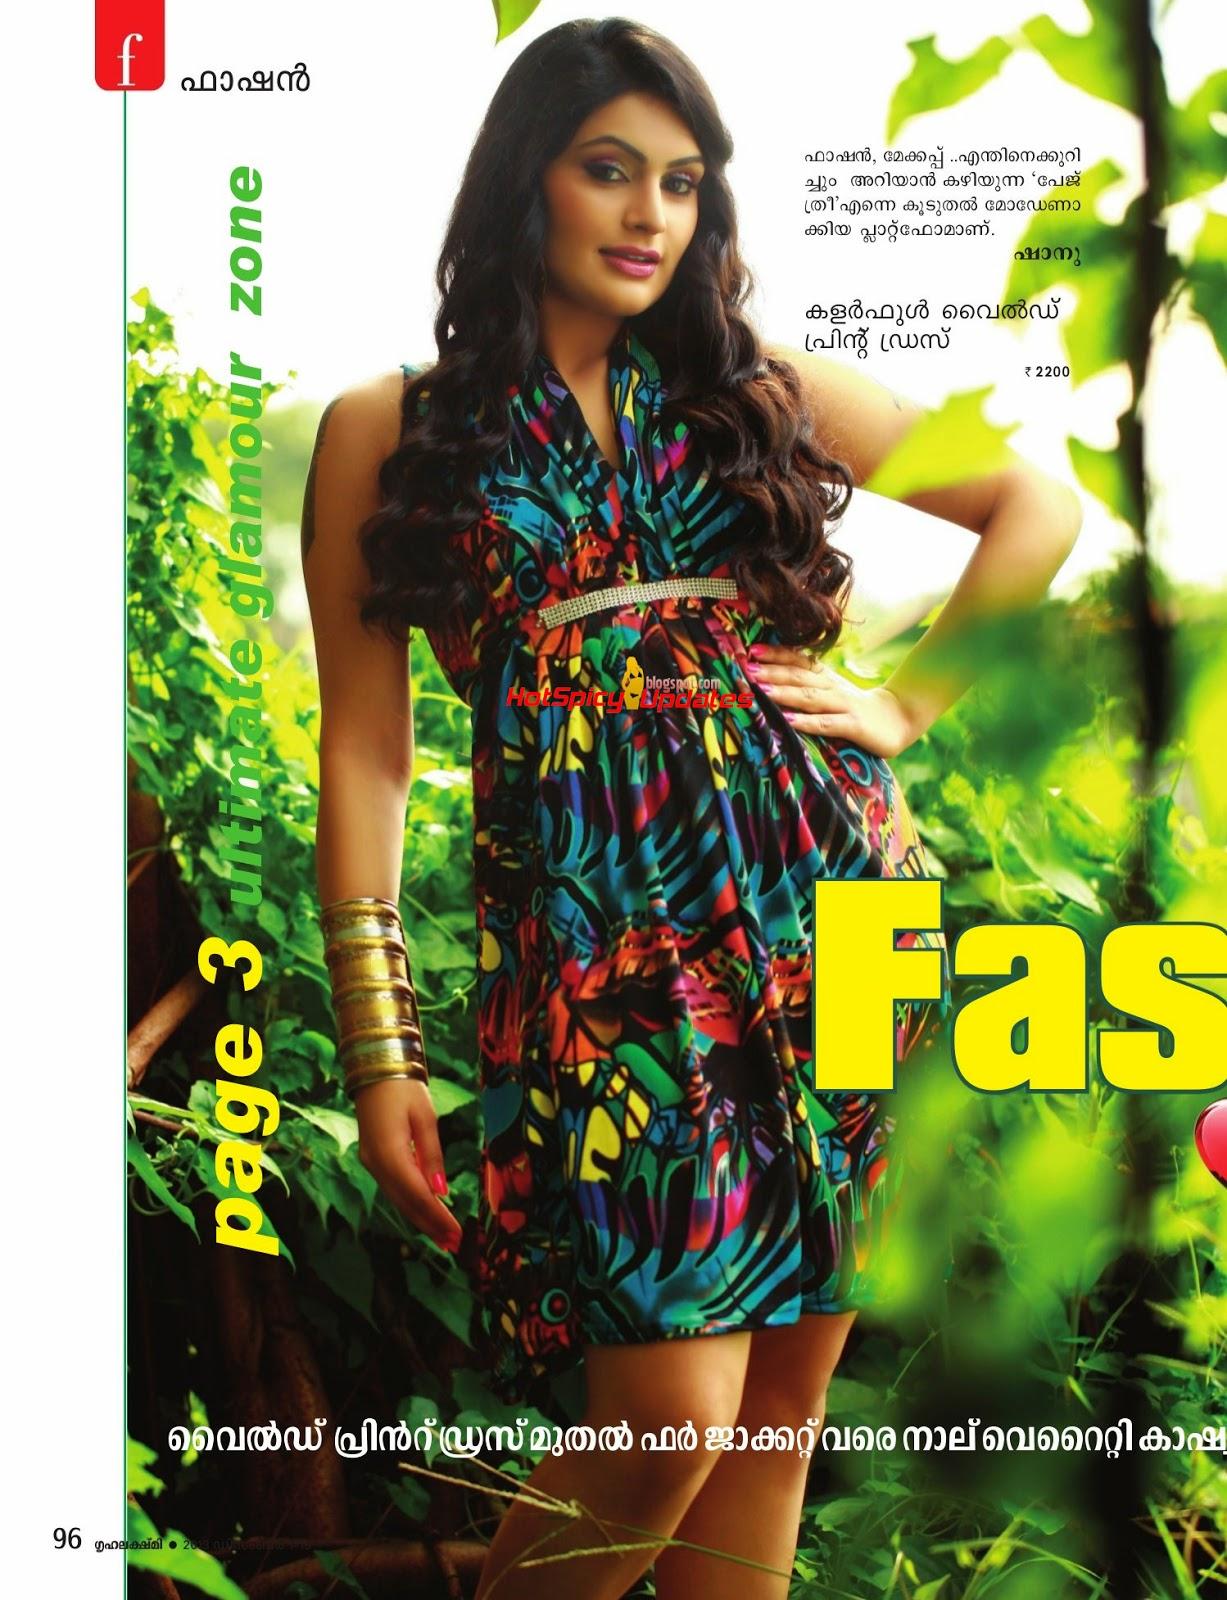 Malayalam actress ranjini hot unseen boobs squeezed - 3 5